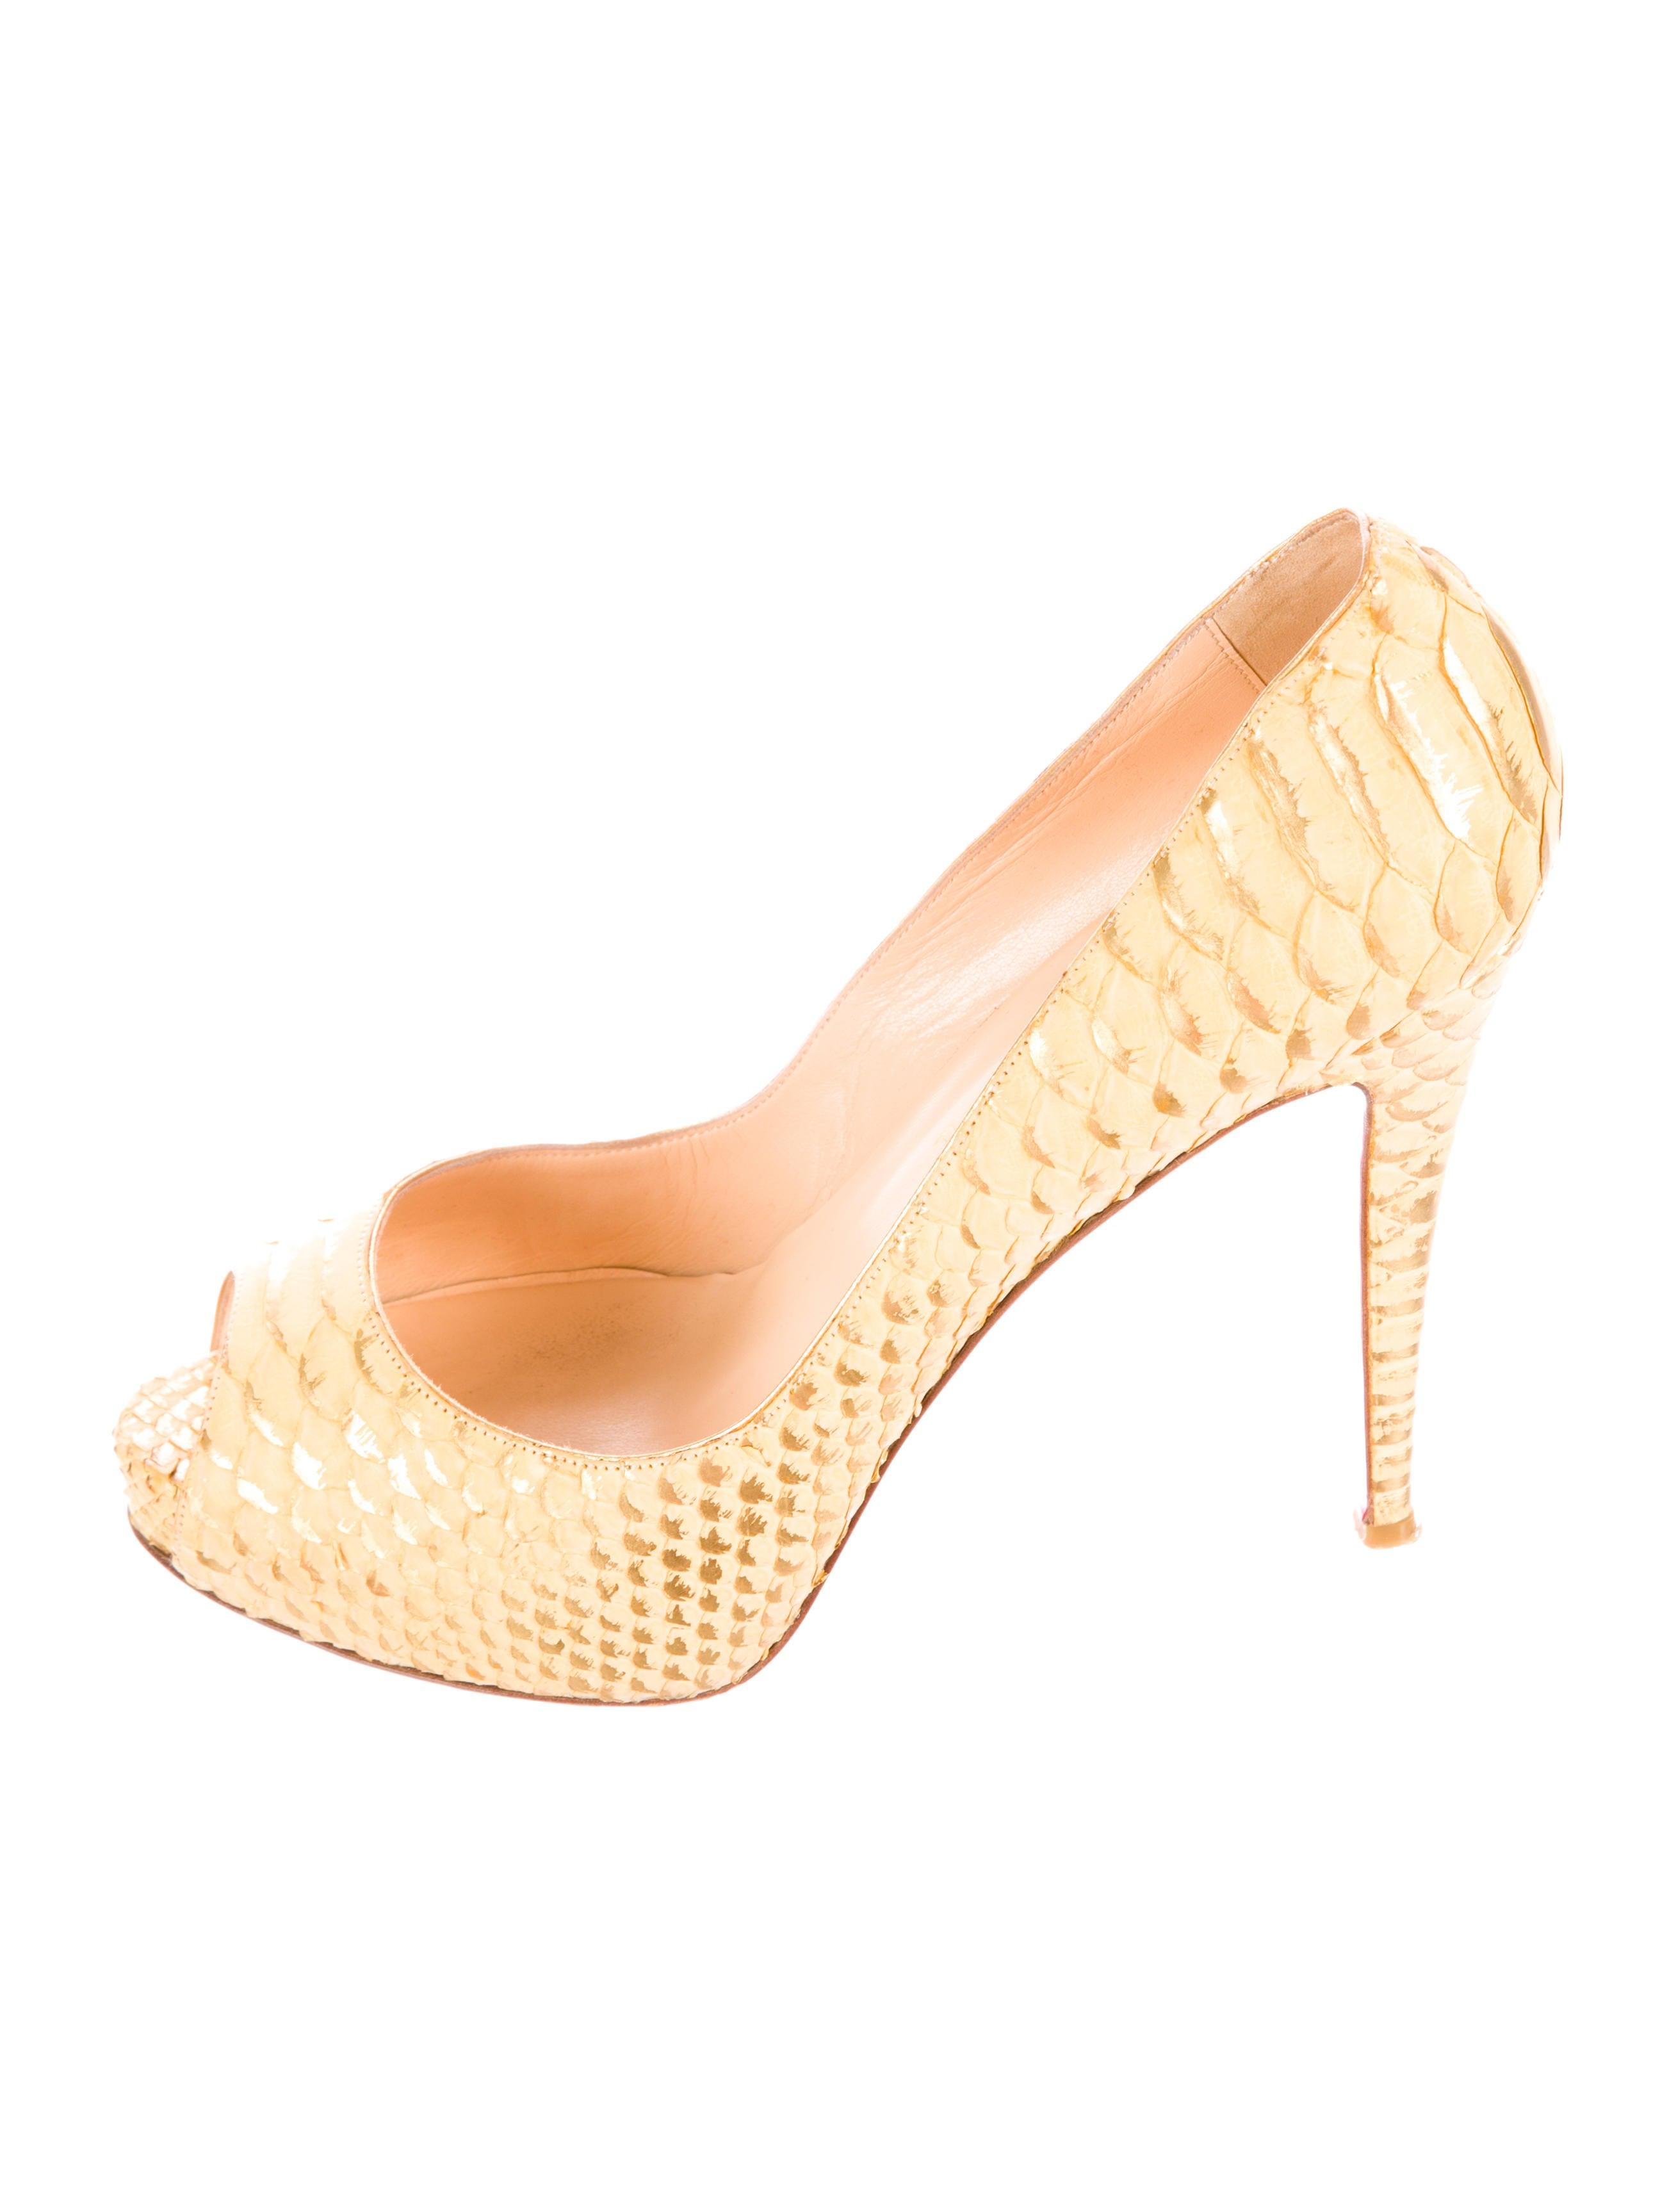 black spiked louis vuitton shoes - Artesur ? christian louboutin Very Prive python peep-toe pumps ...